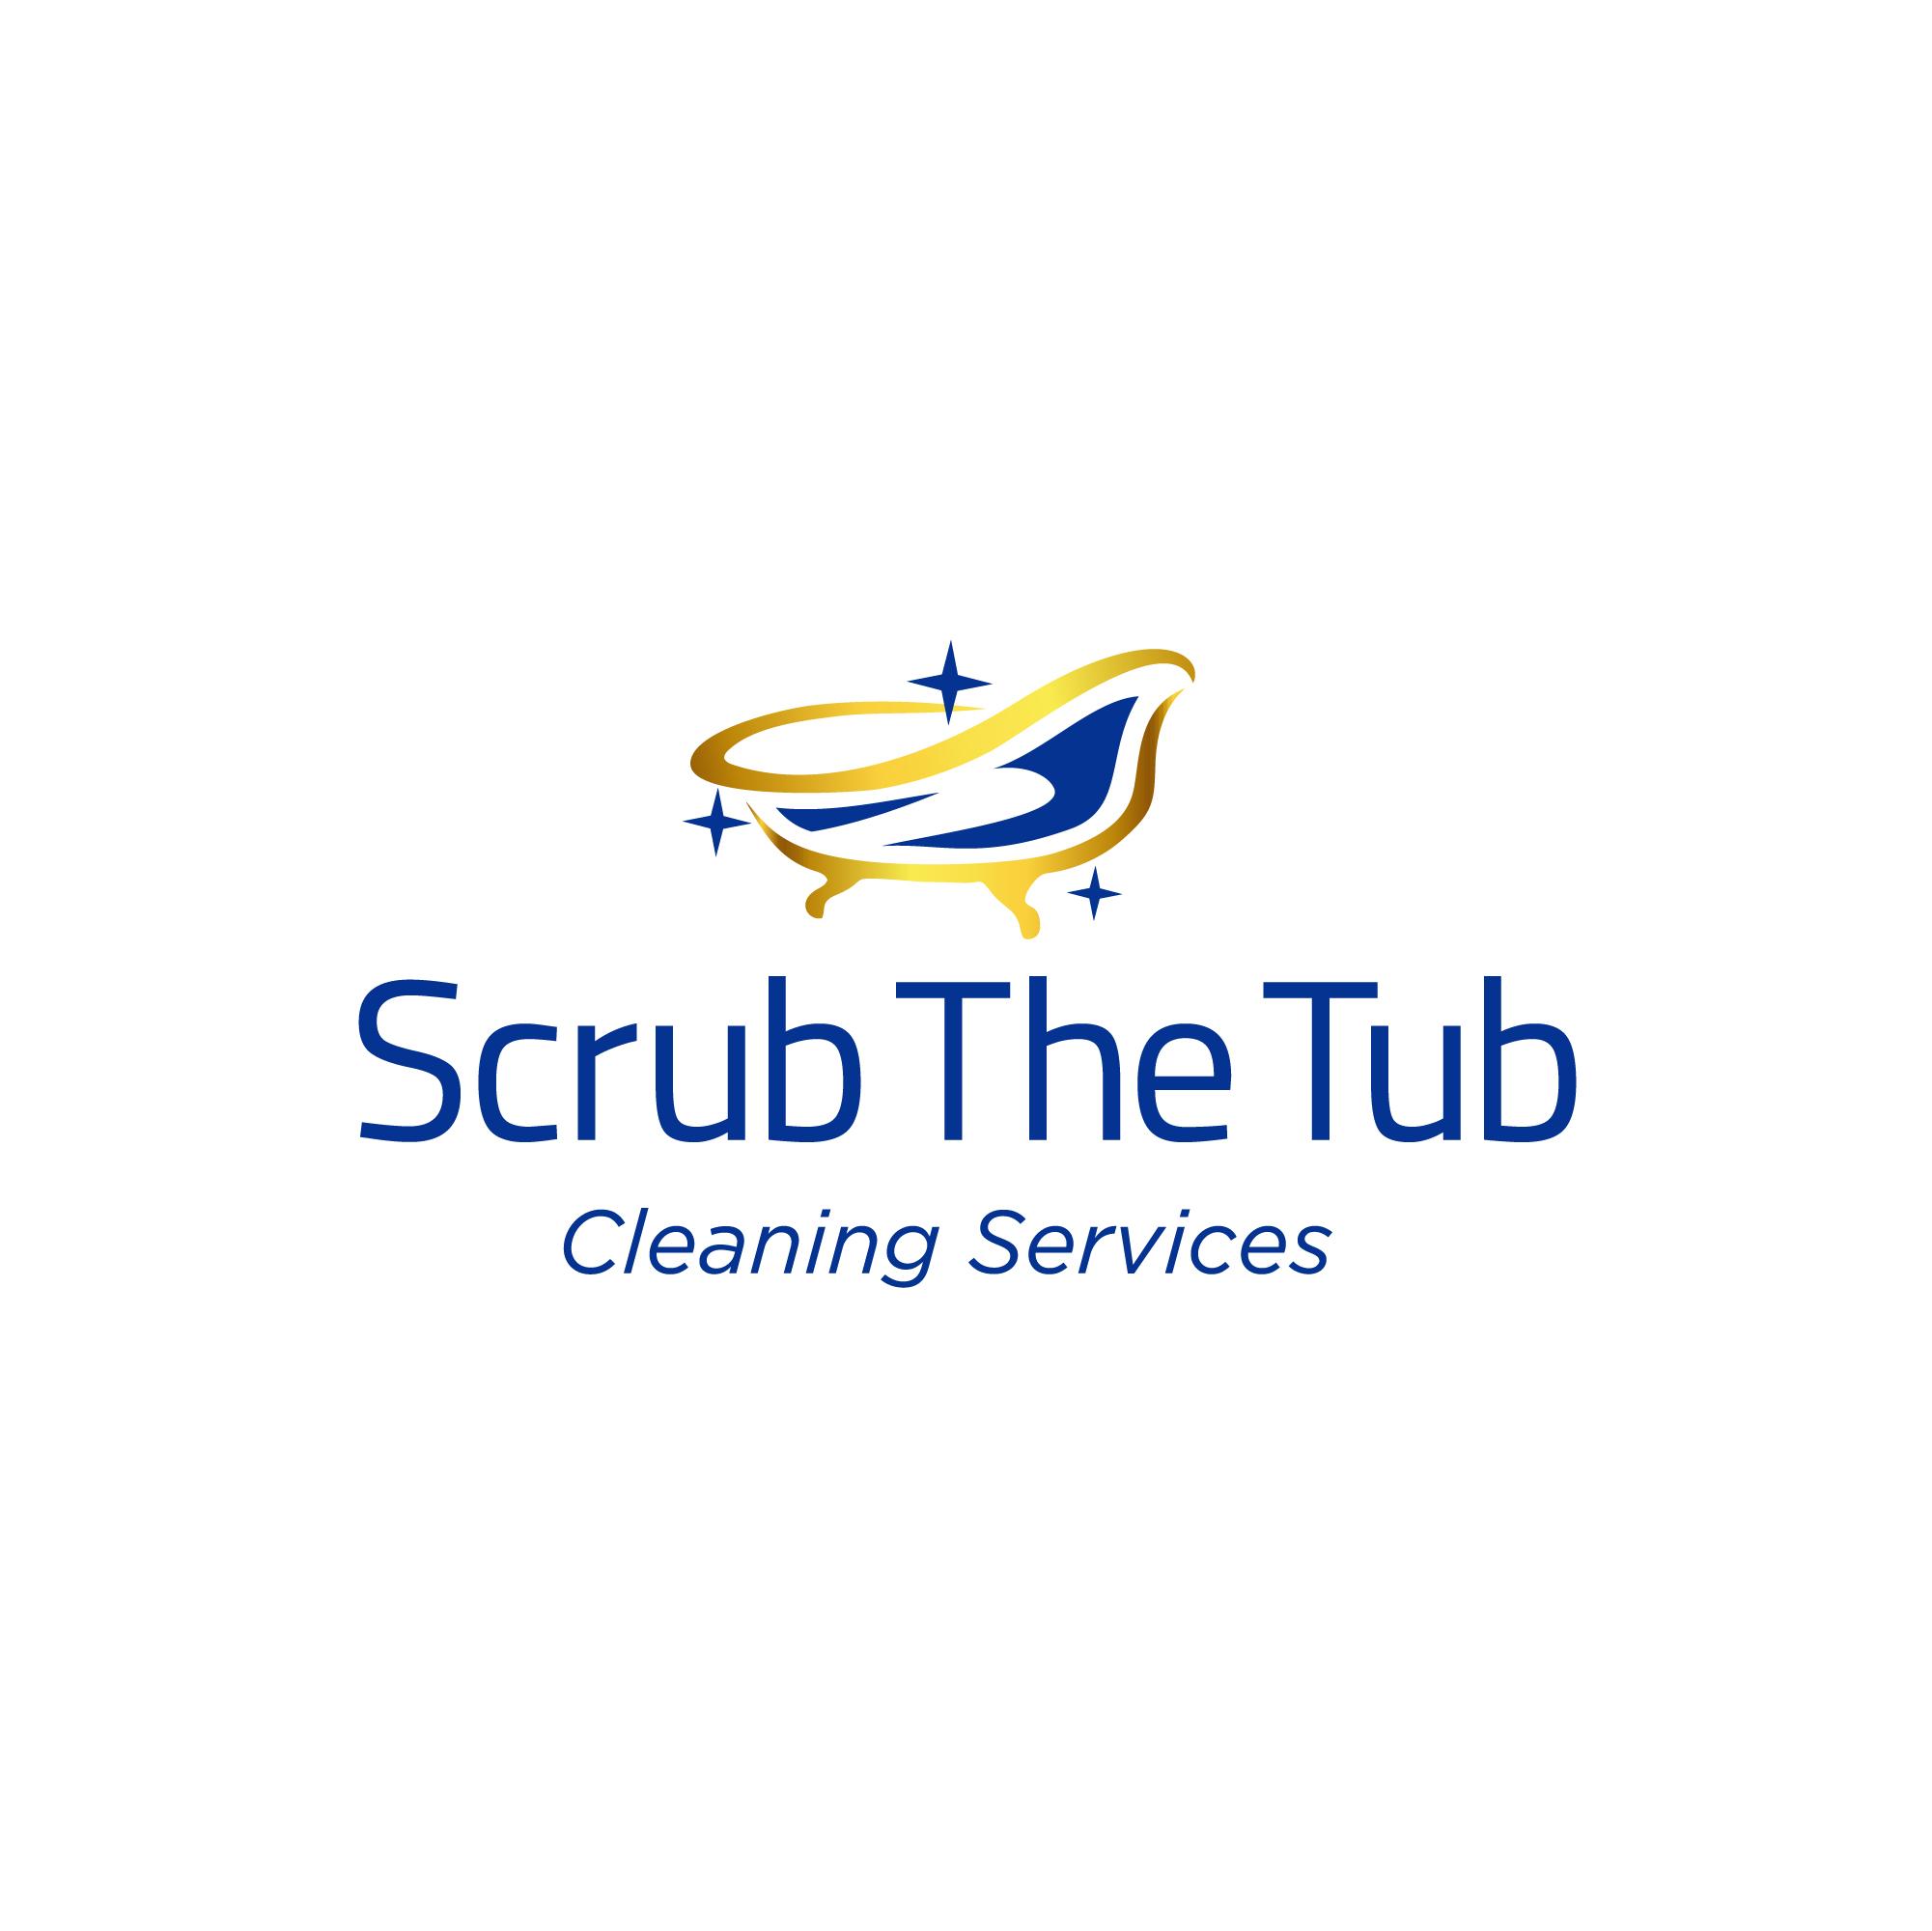 Scrub The Tub